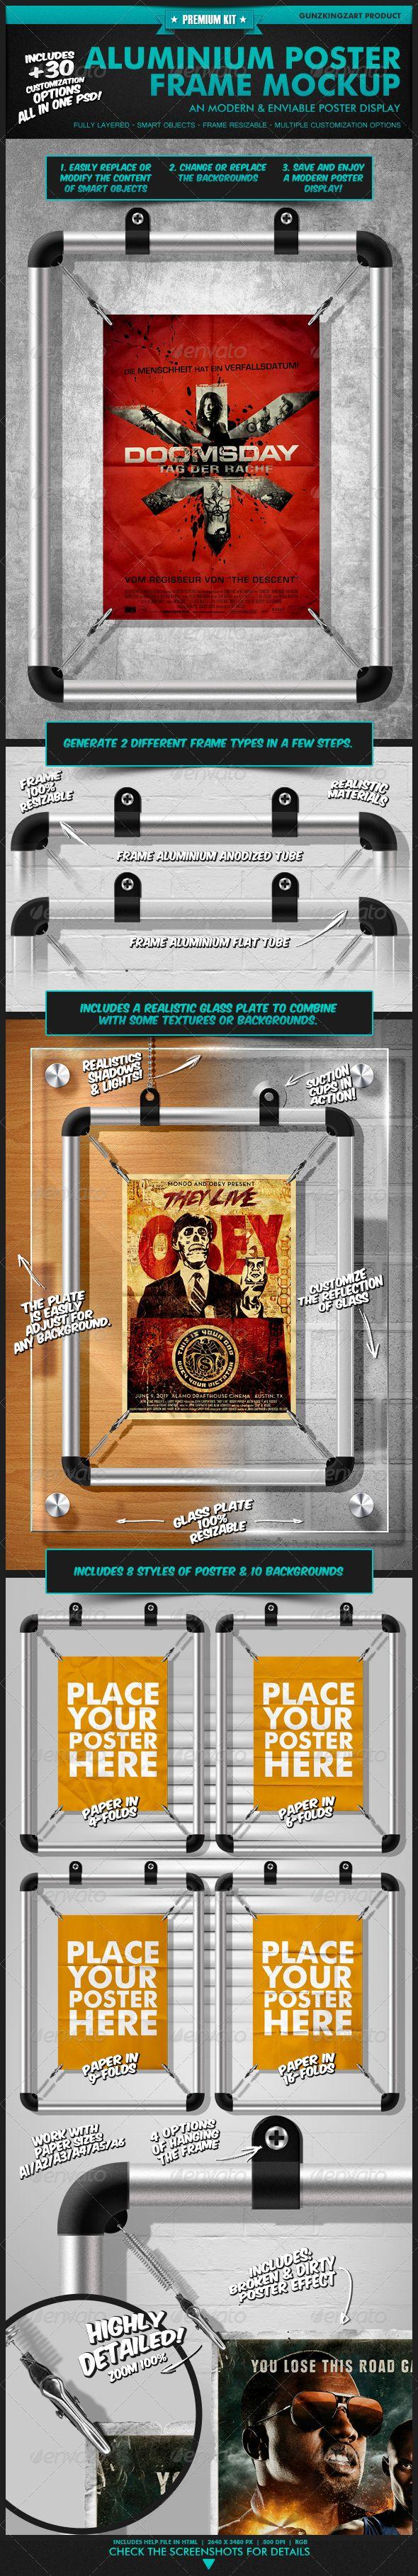 Aluminium Poster Frame Mockup - Premium Kit